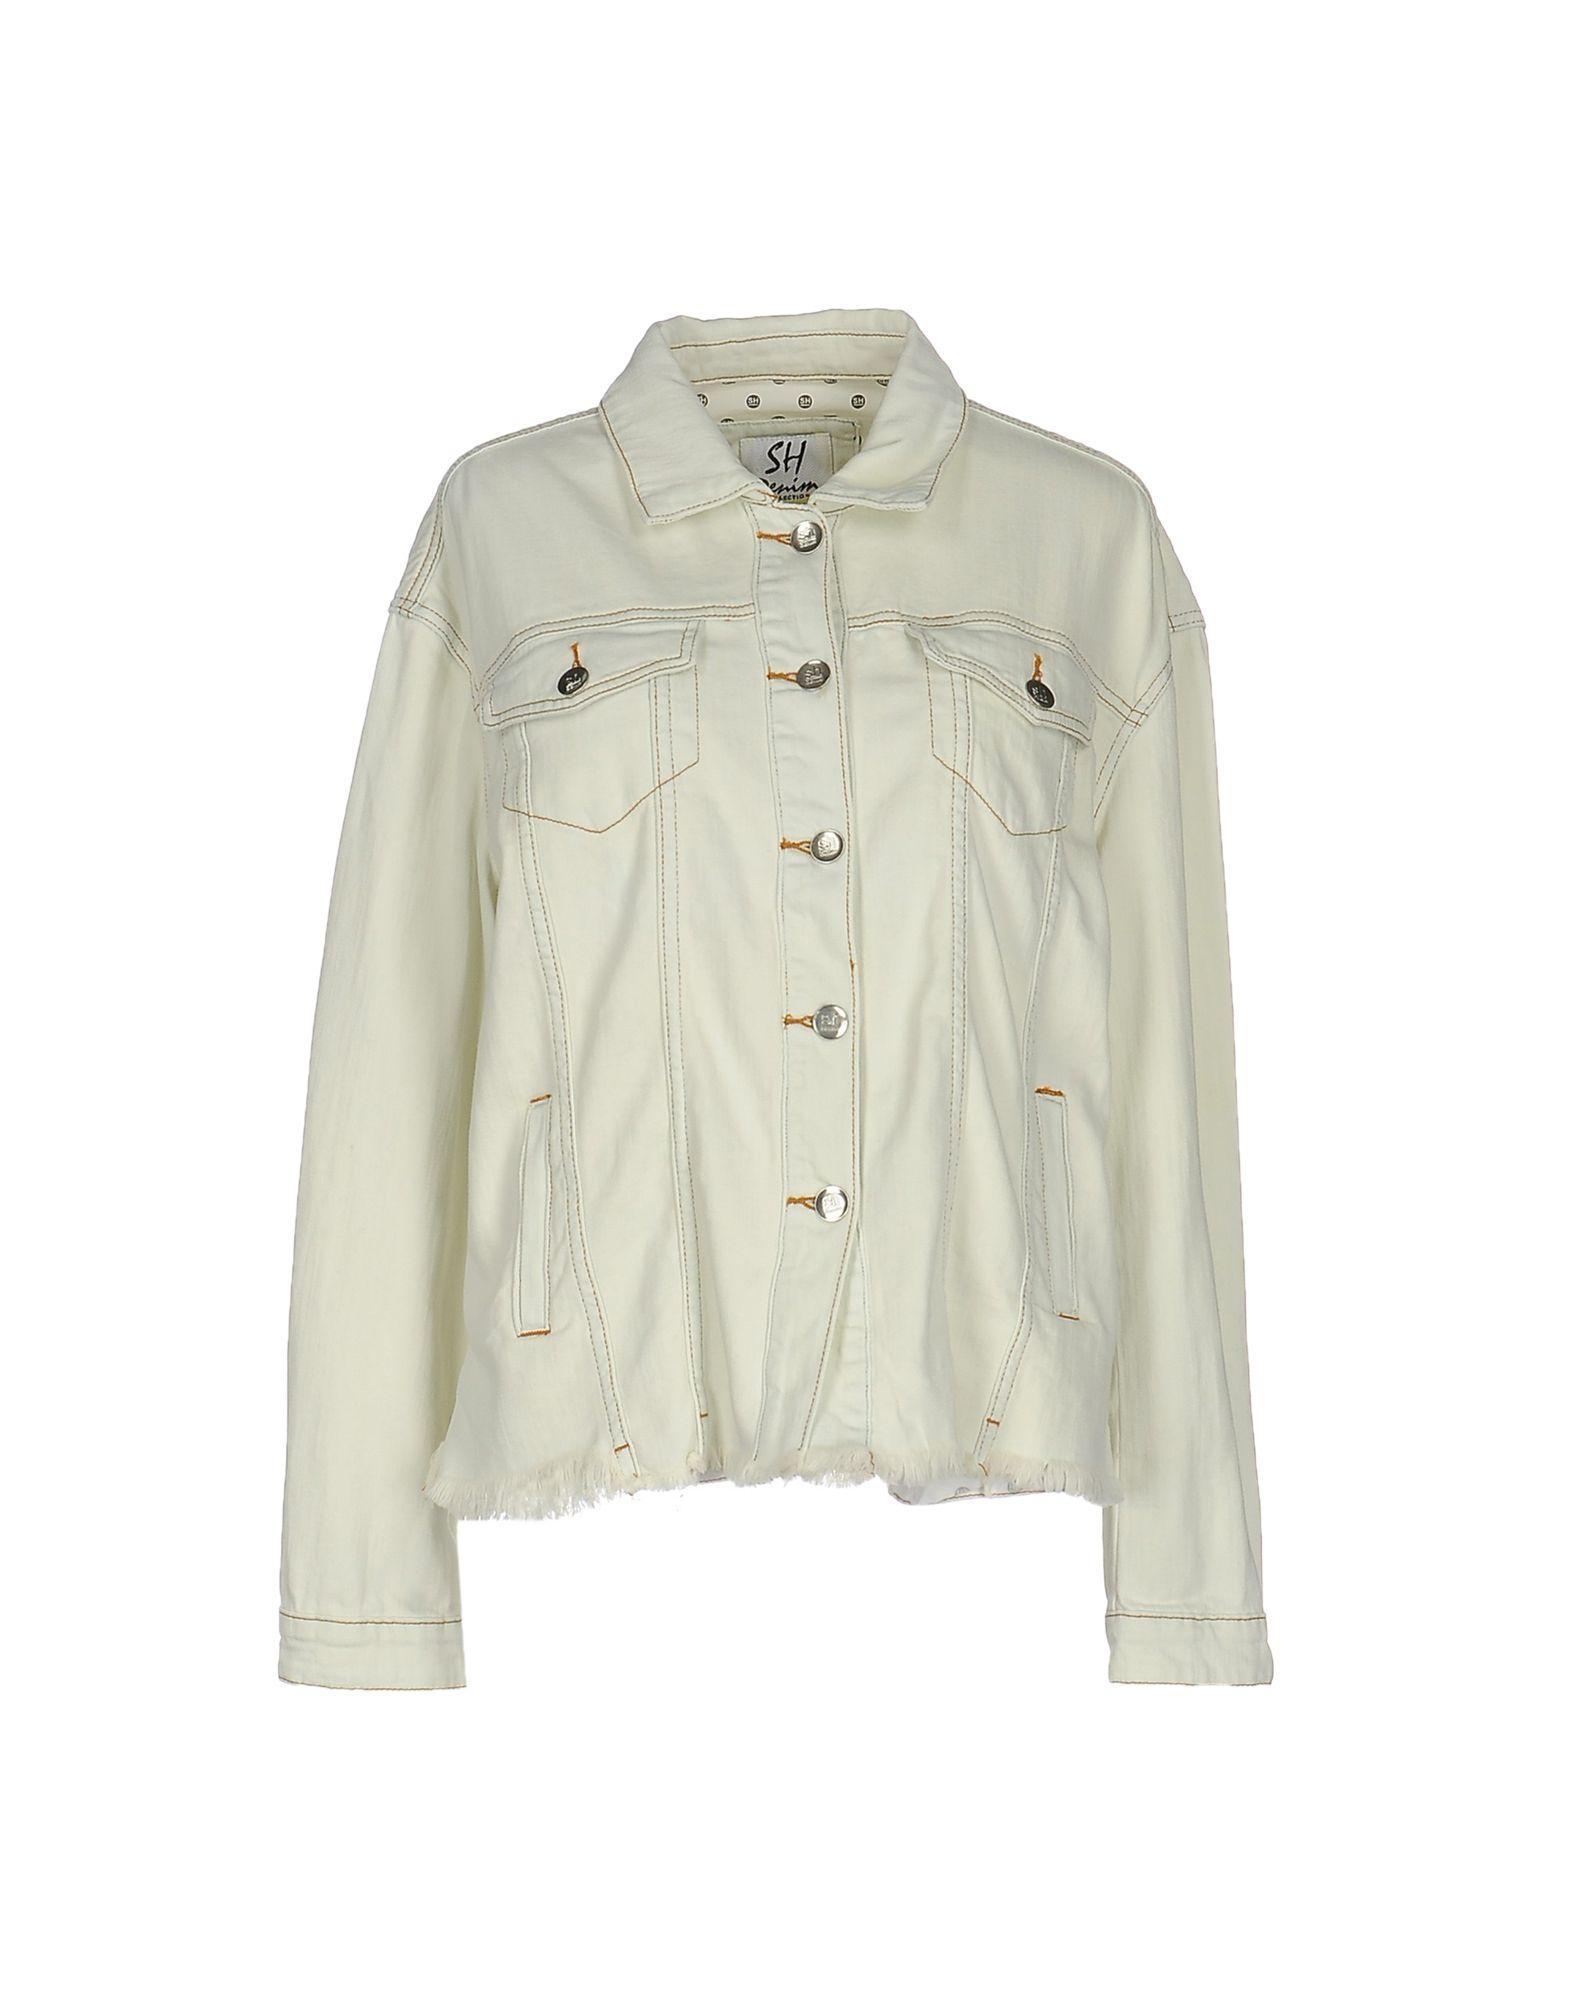 SH by SILVIAN HEACH Джинсовая верхняя одежда silvian heach джинсовая верхняя одежда